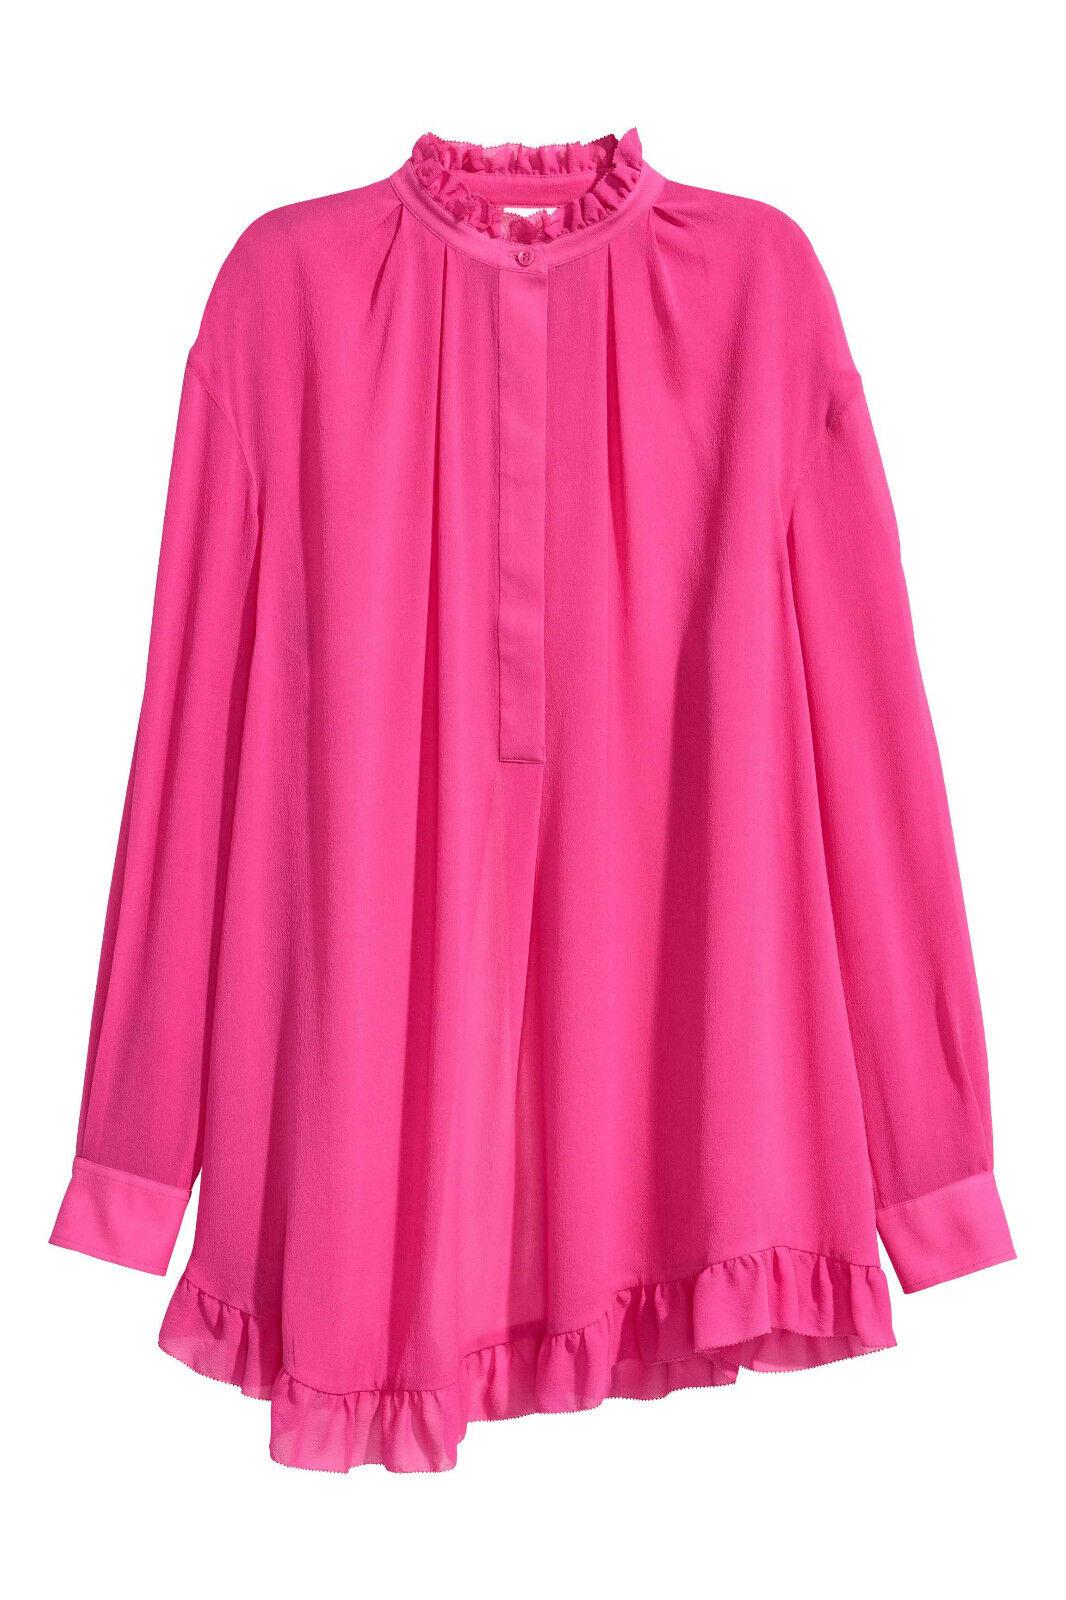 H&M STUDIO SILK Flounced Cerise Rosa Wide Tunic Frill Blouse Dress